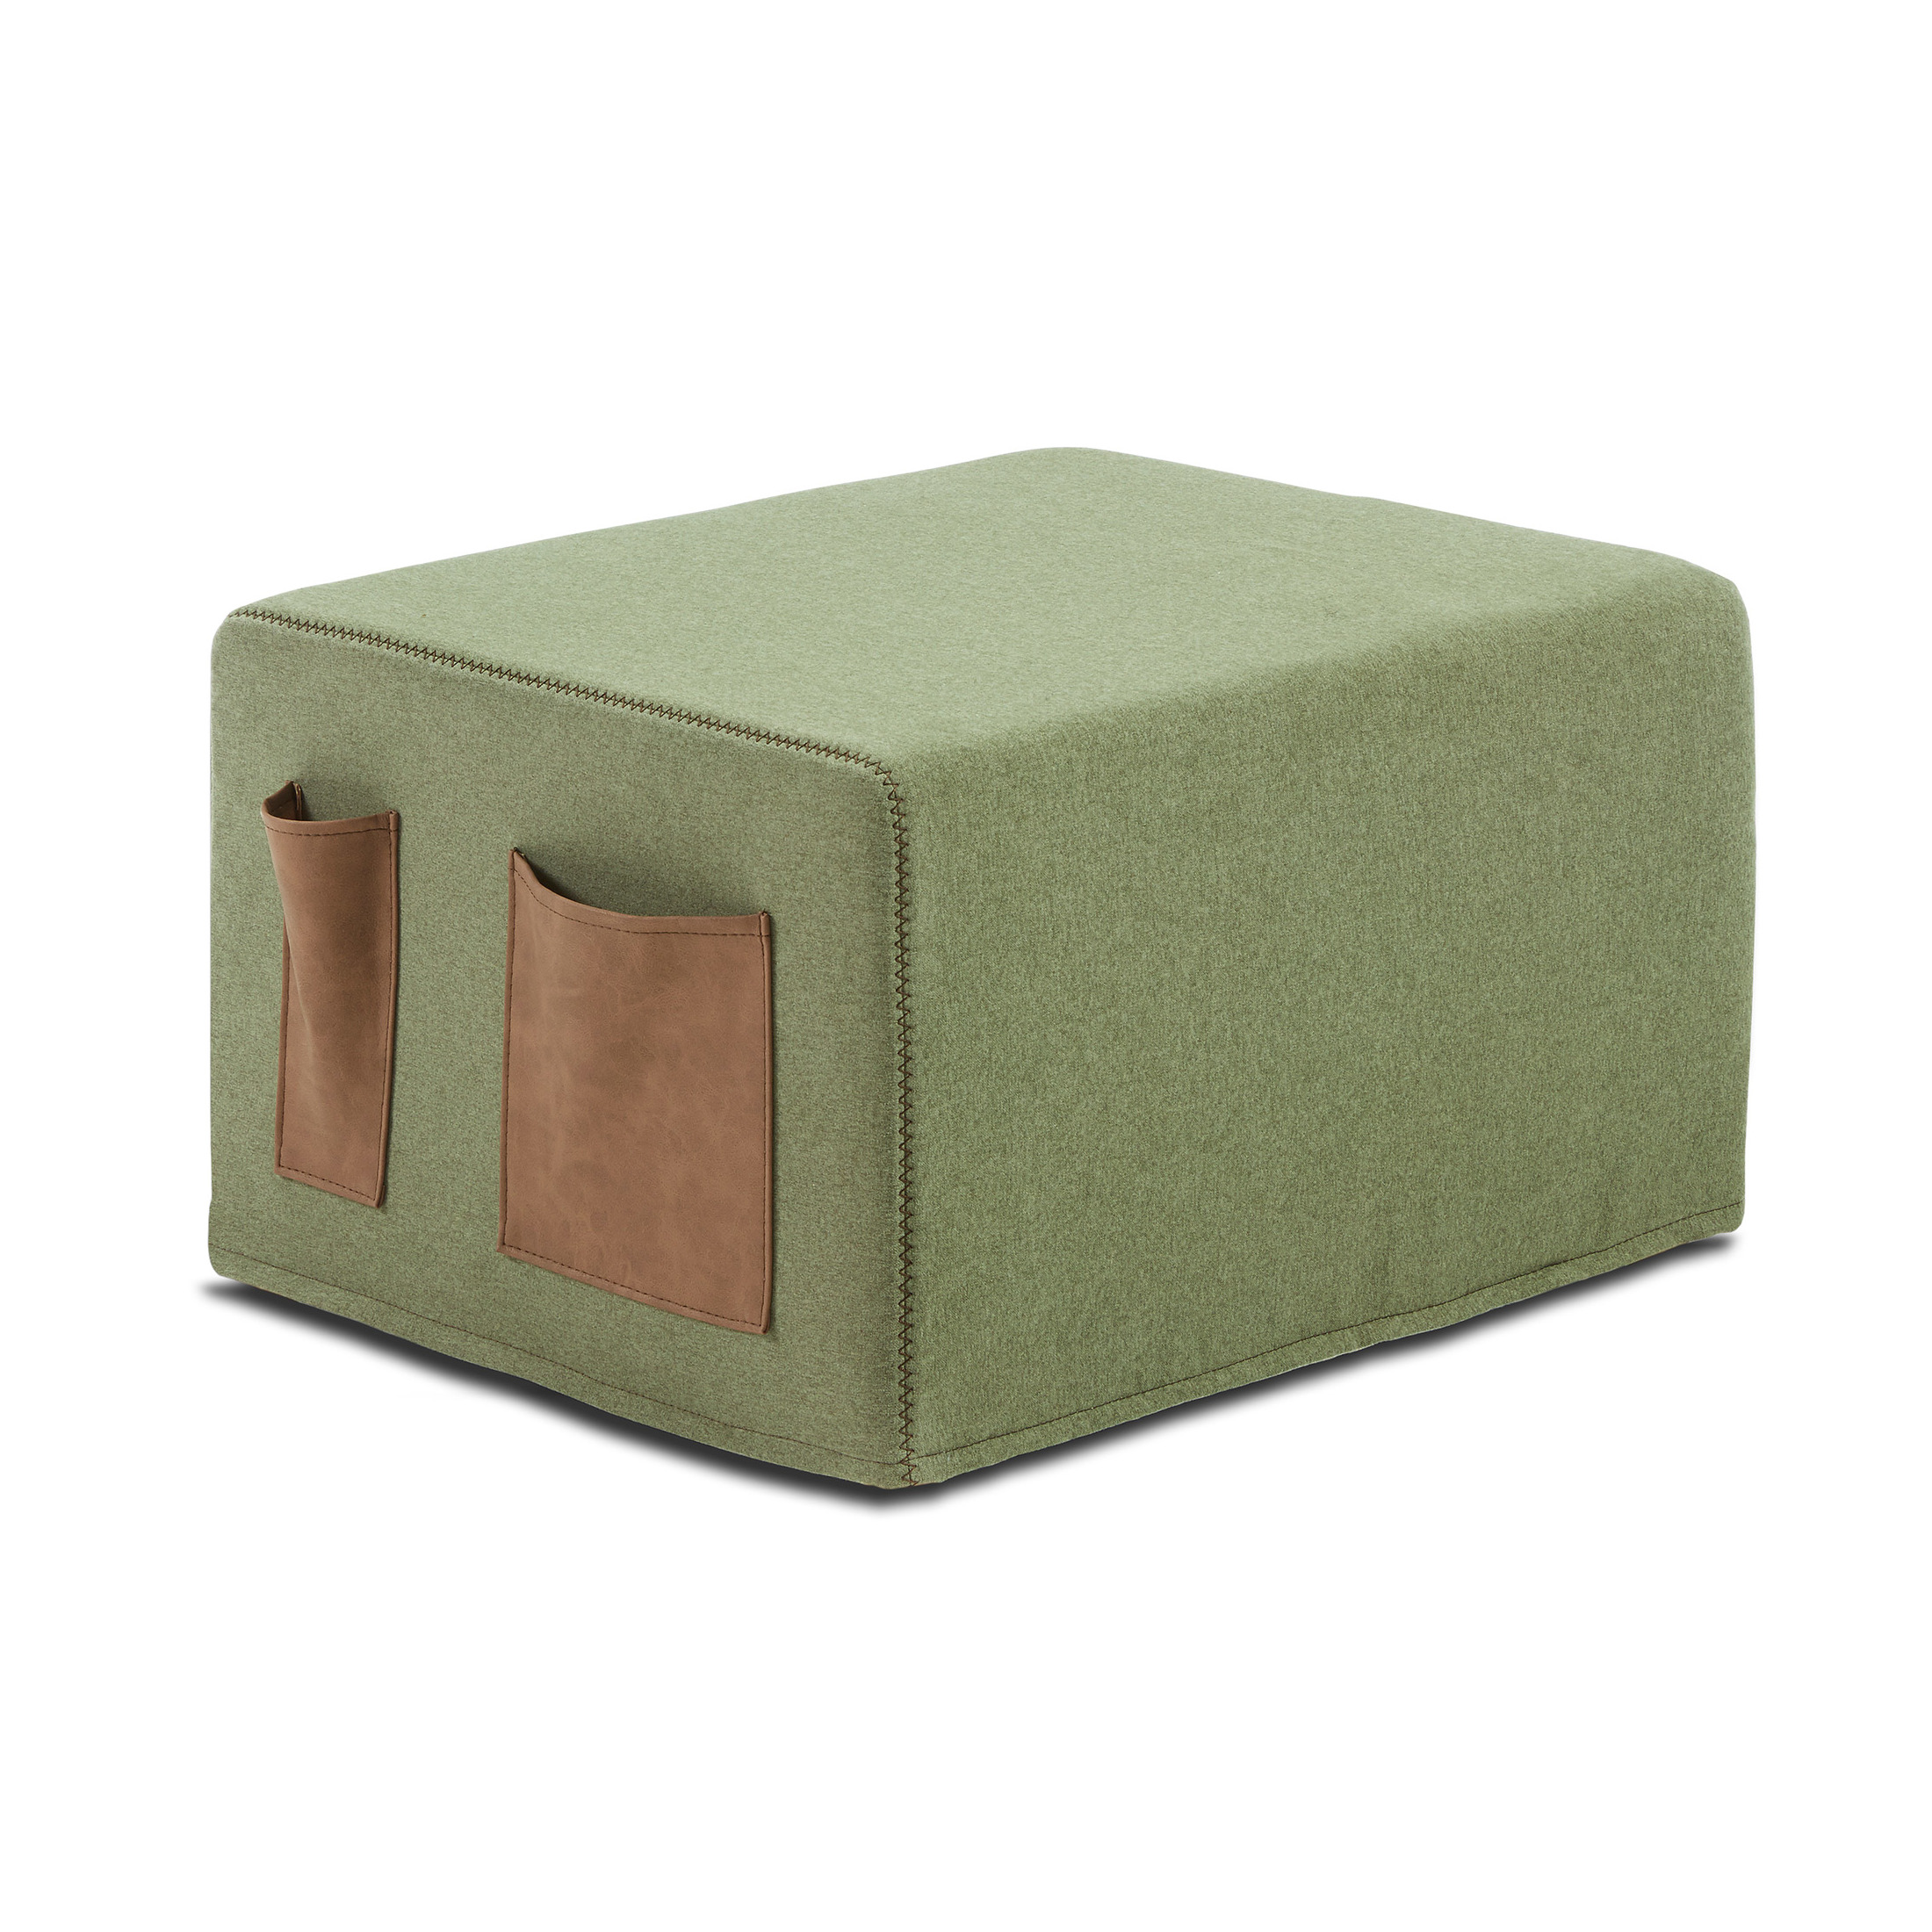 Kave Home Poef / vouwbed Verdi, kleur Groen